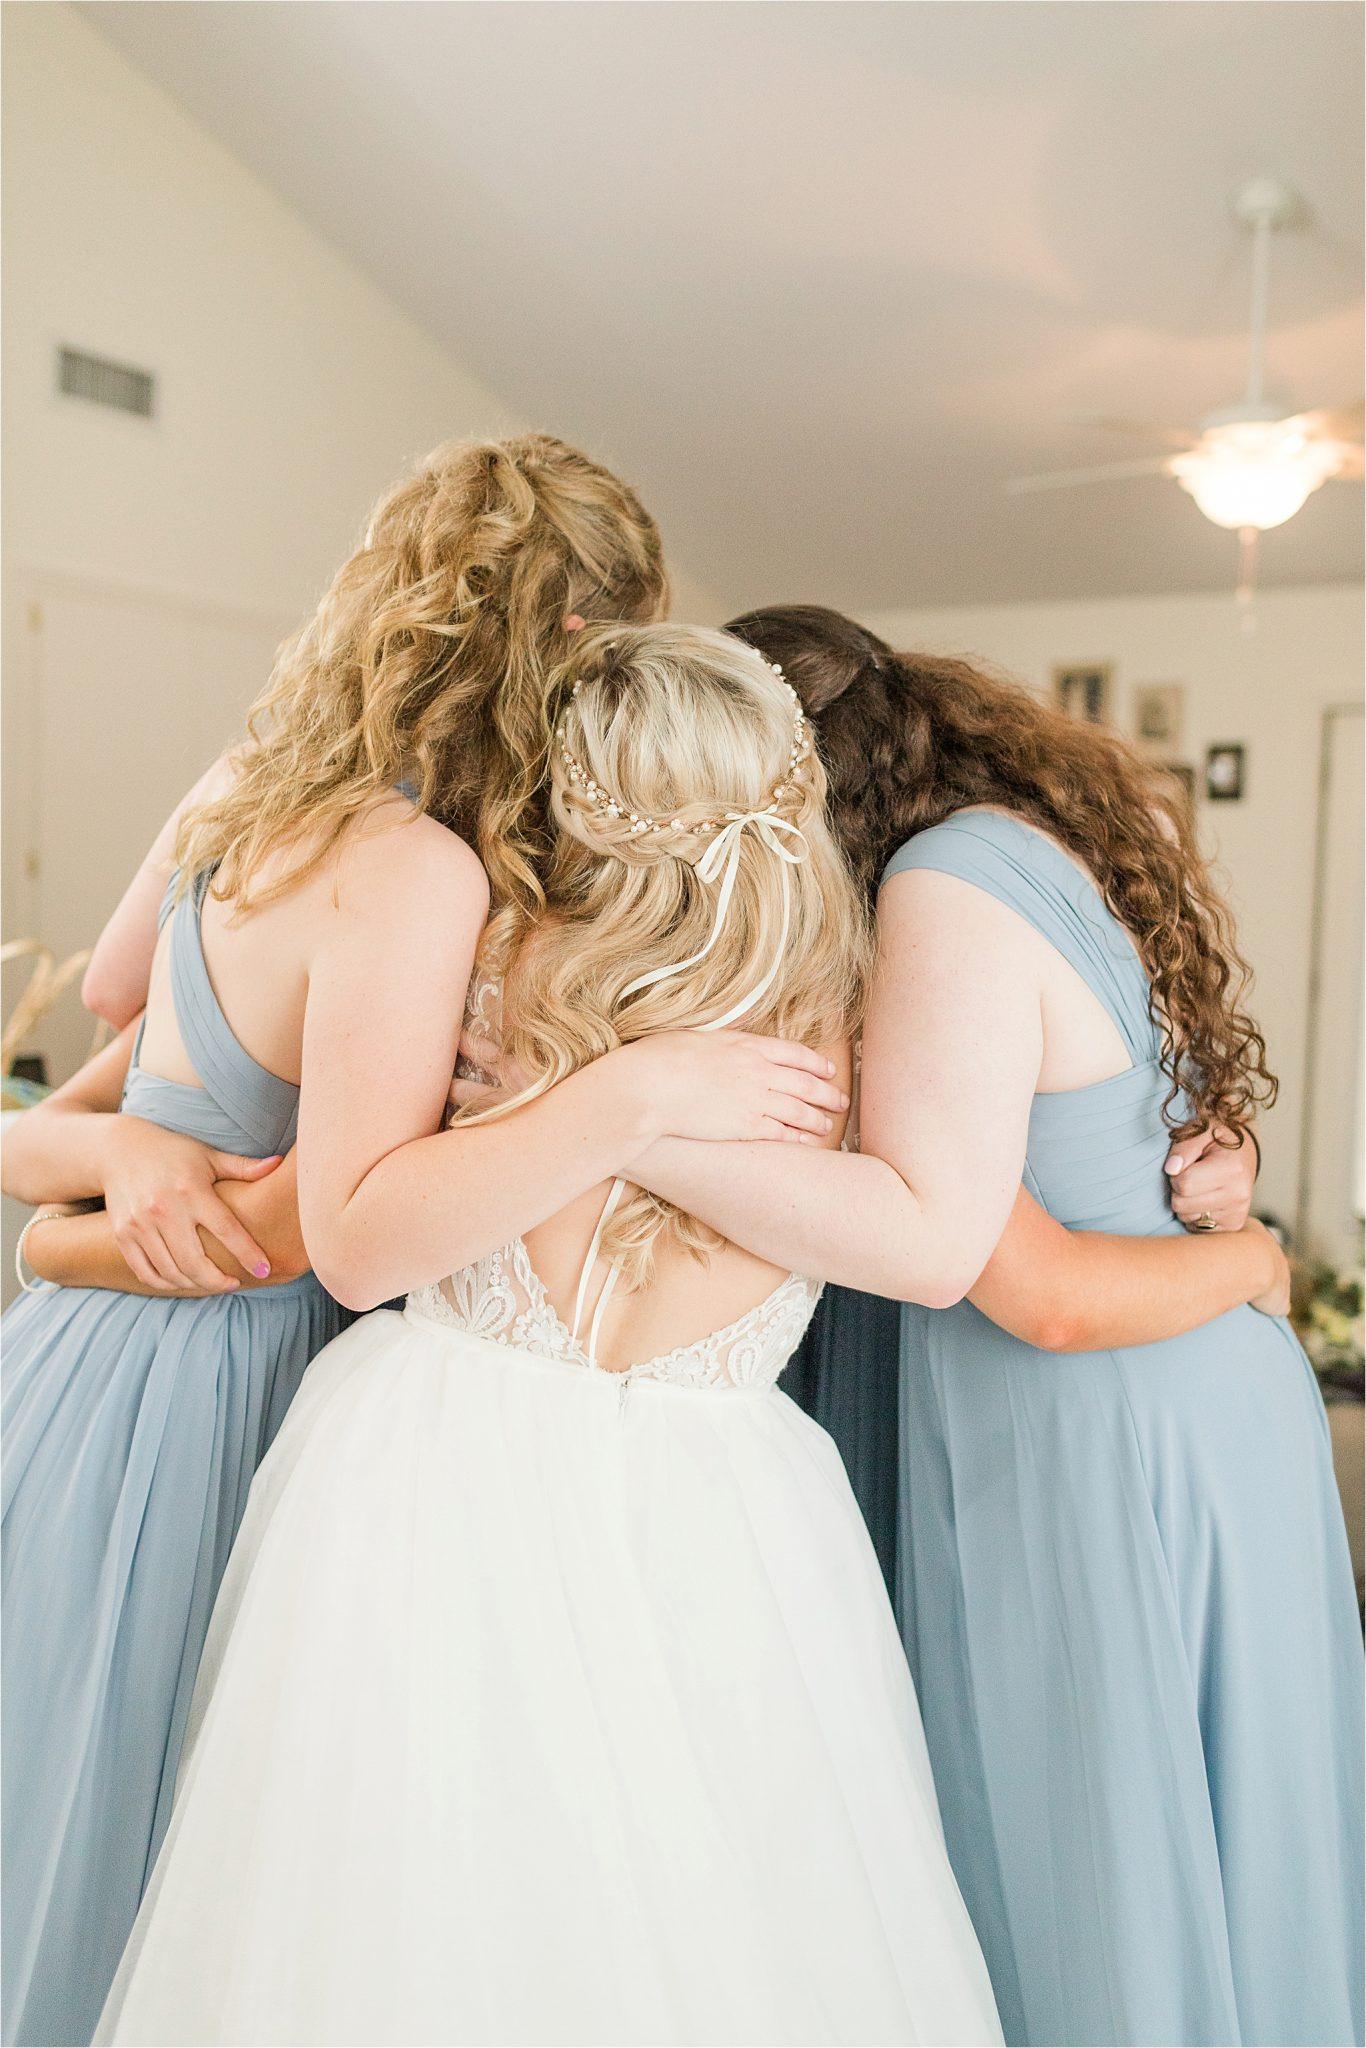 bride-bridesmaids-precious-moments-periwinkle-dusty-light-blue-wedding-cute-photo-ideas